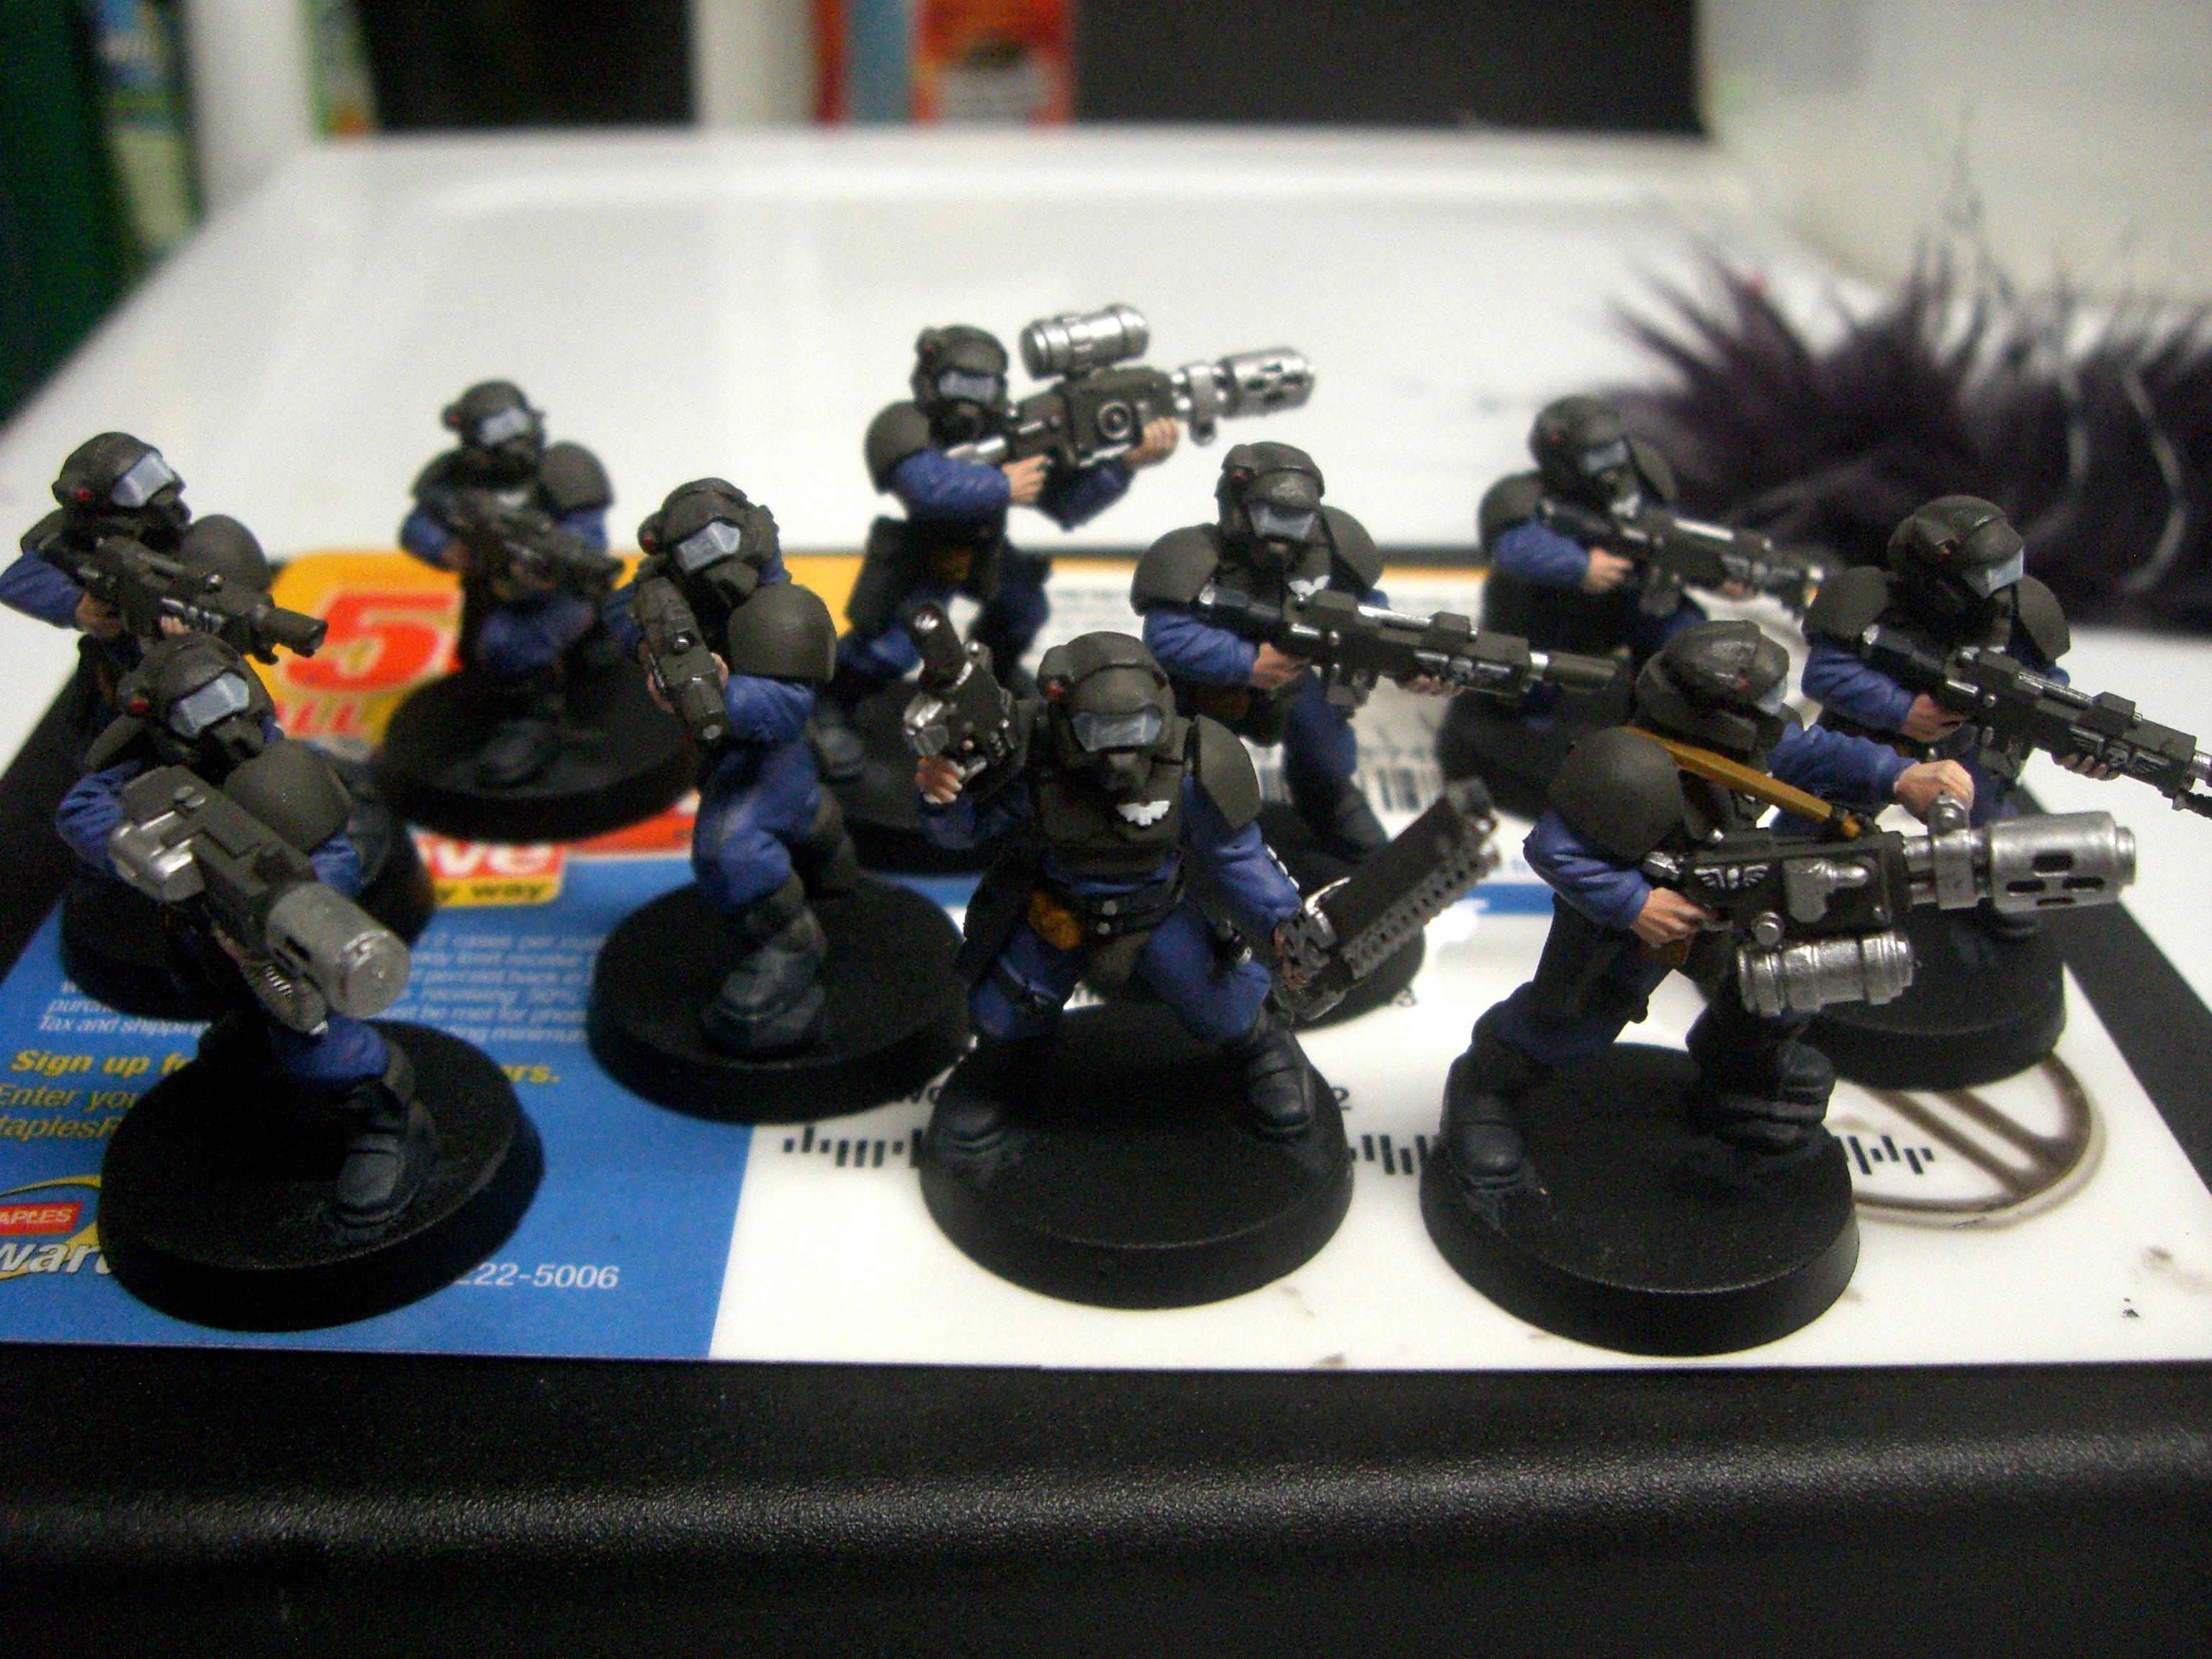 Adeptus Arbites, Imperial Guard, Odst, Penal Squad, Quickshade, Swat, Veteran, Work In Progress